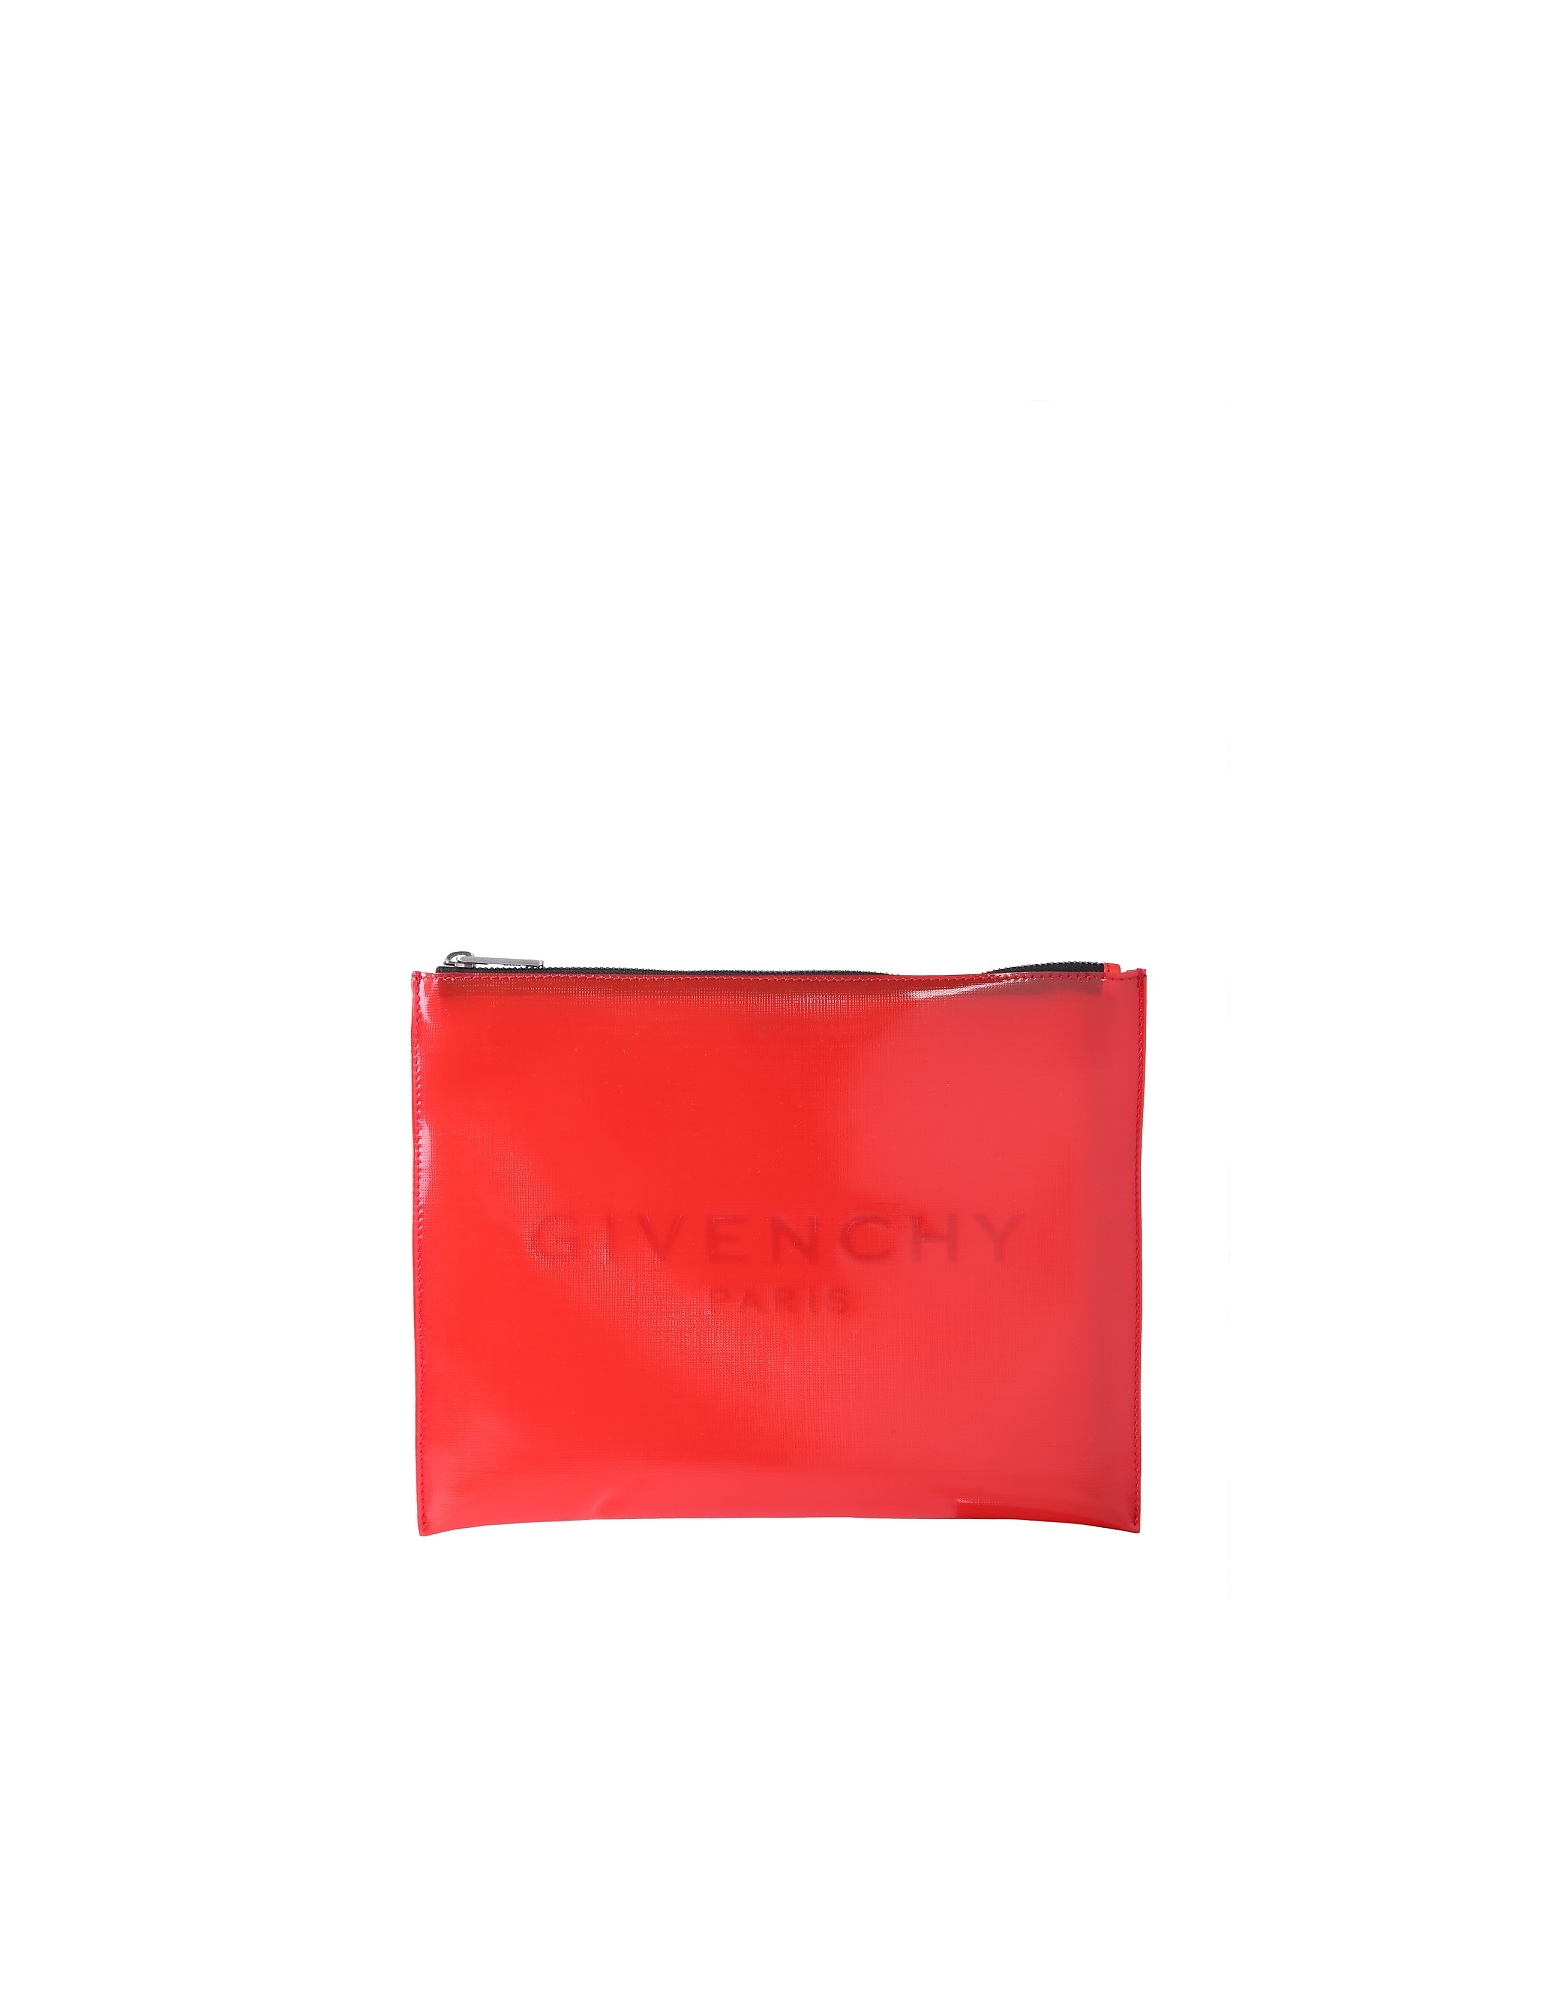 Givenchy Designer Men's Bags, Large Pouch